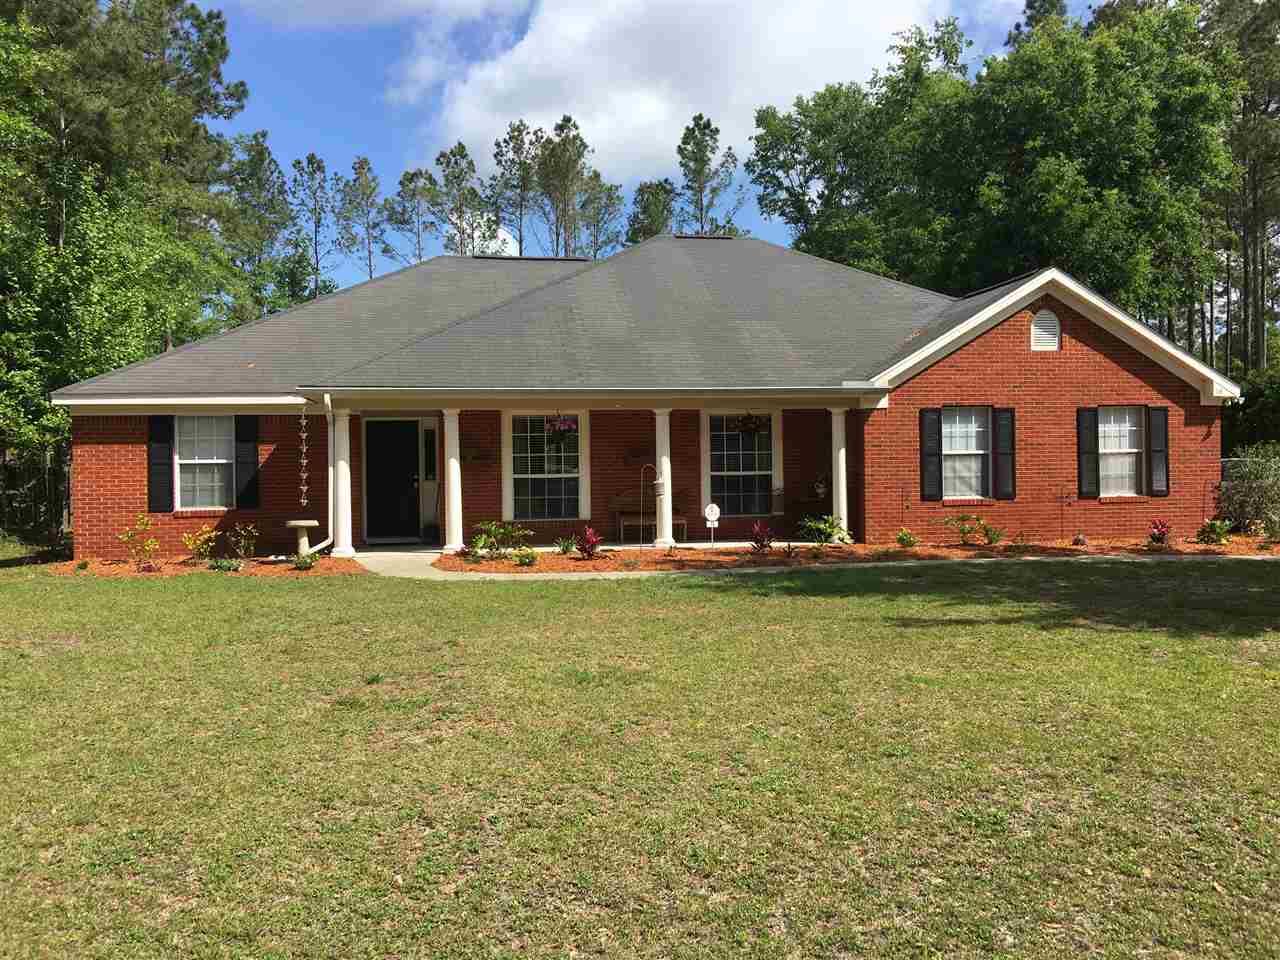 Property ID 284860